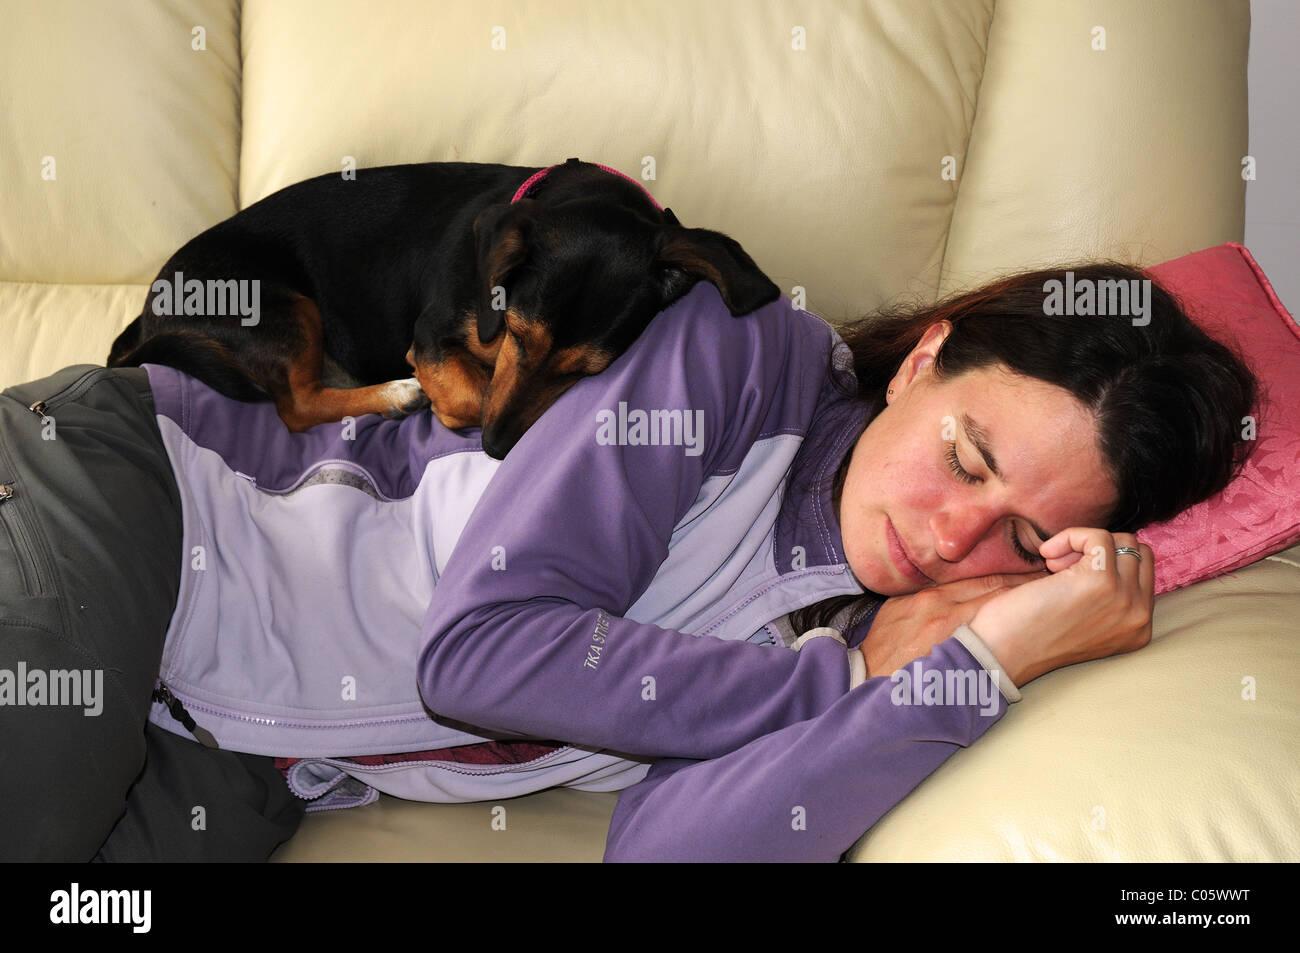 a-dog-curled-up-asleep-on-a-sleeping-woman-C05WWT.jpg